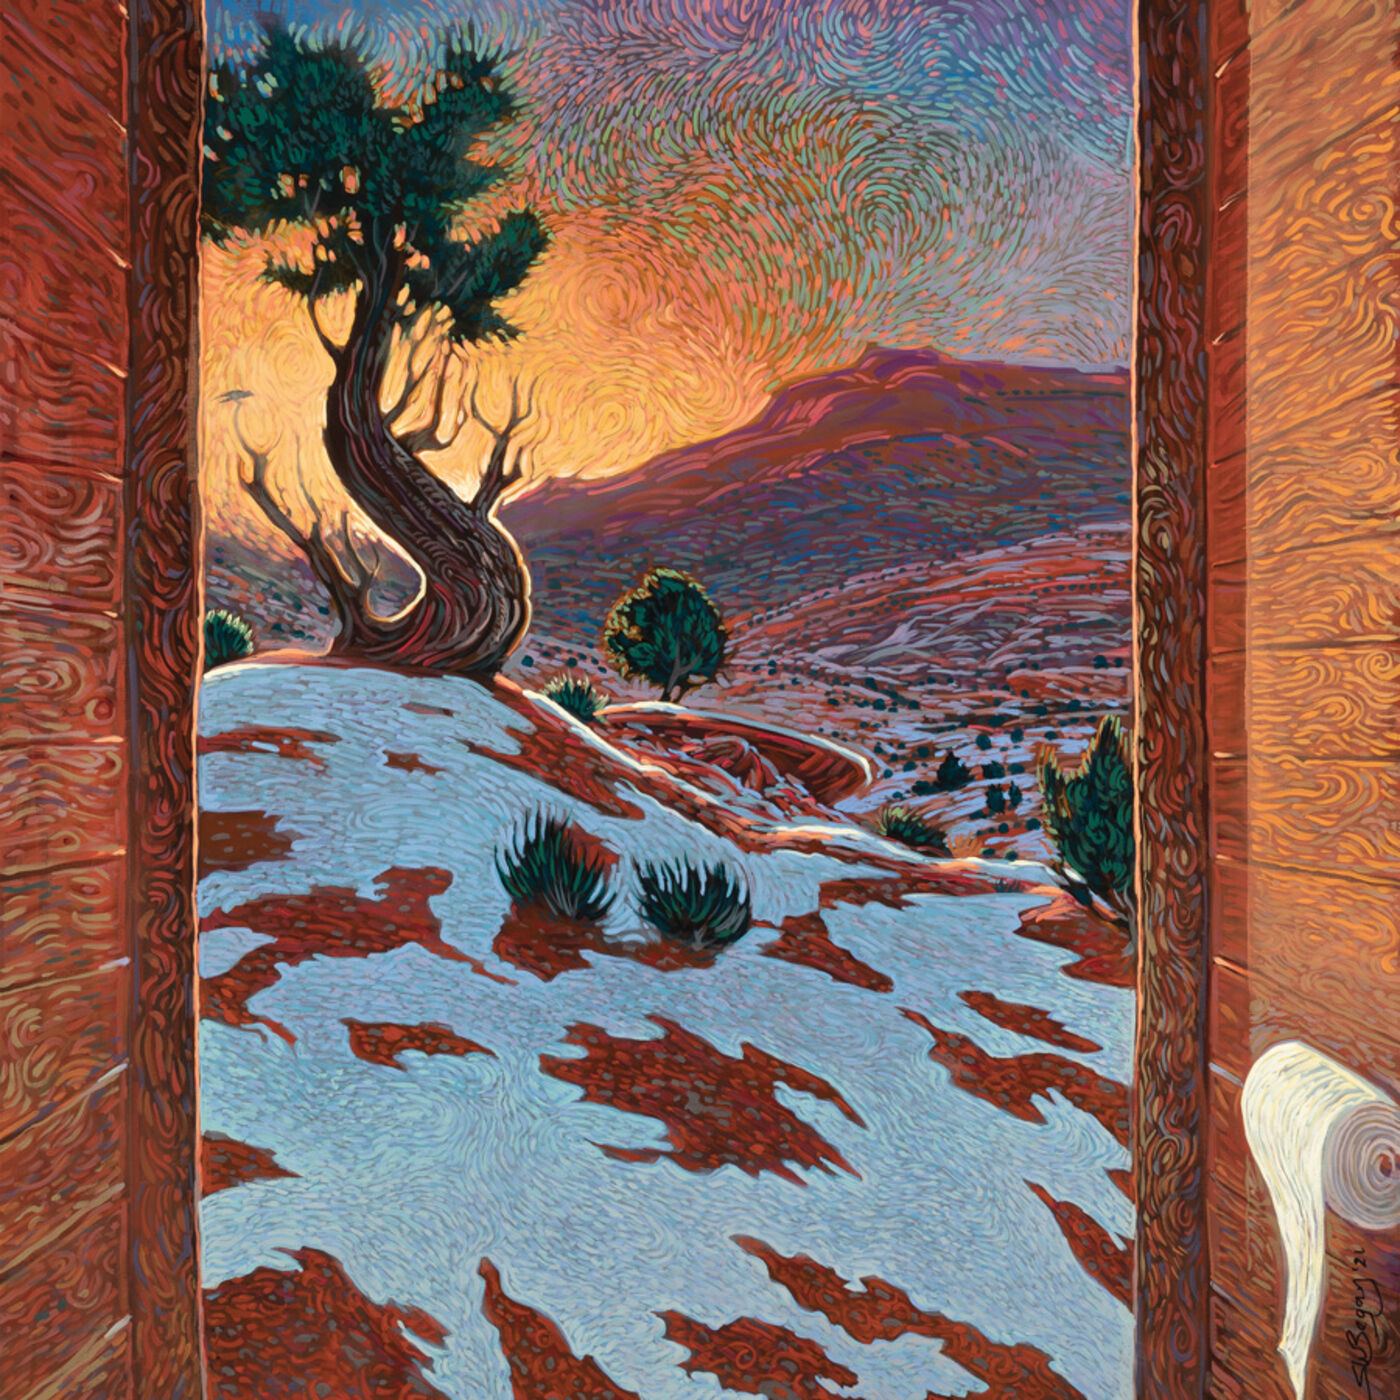 Shonto Begay: Navajo Artist, Educator, and Author - Epi. 148, Host Dr. Mark Sublette